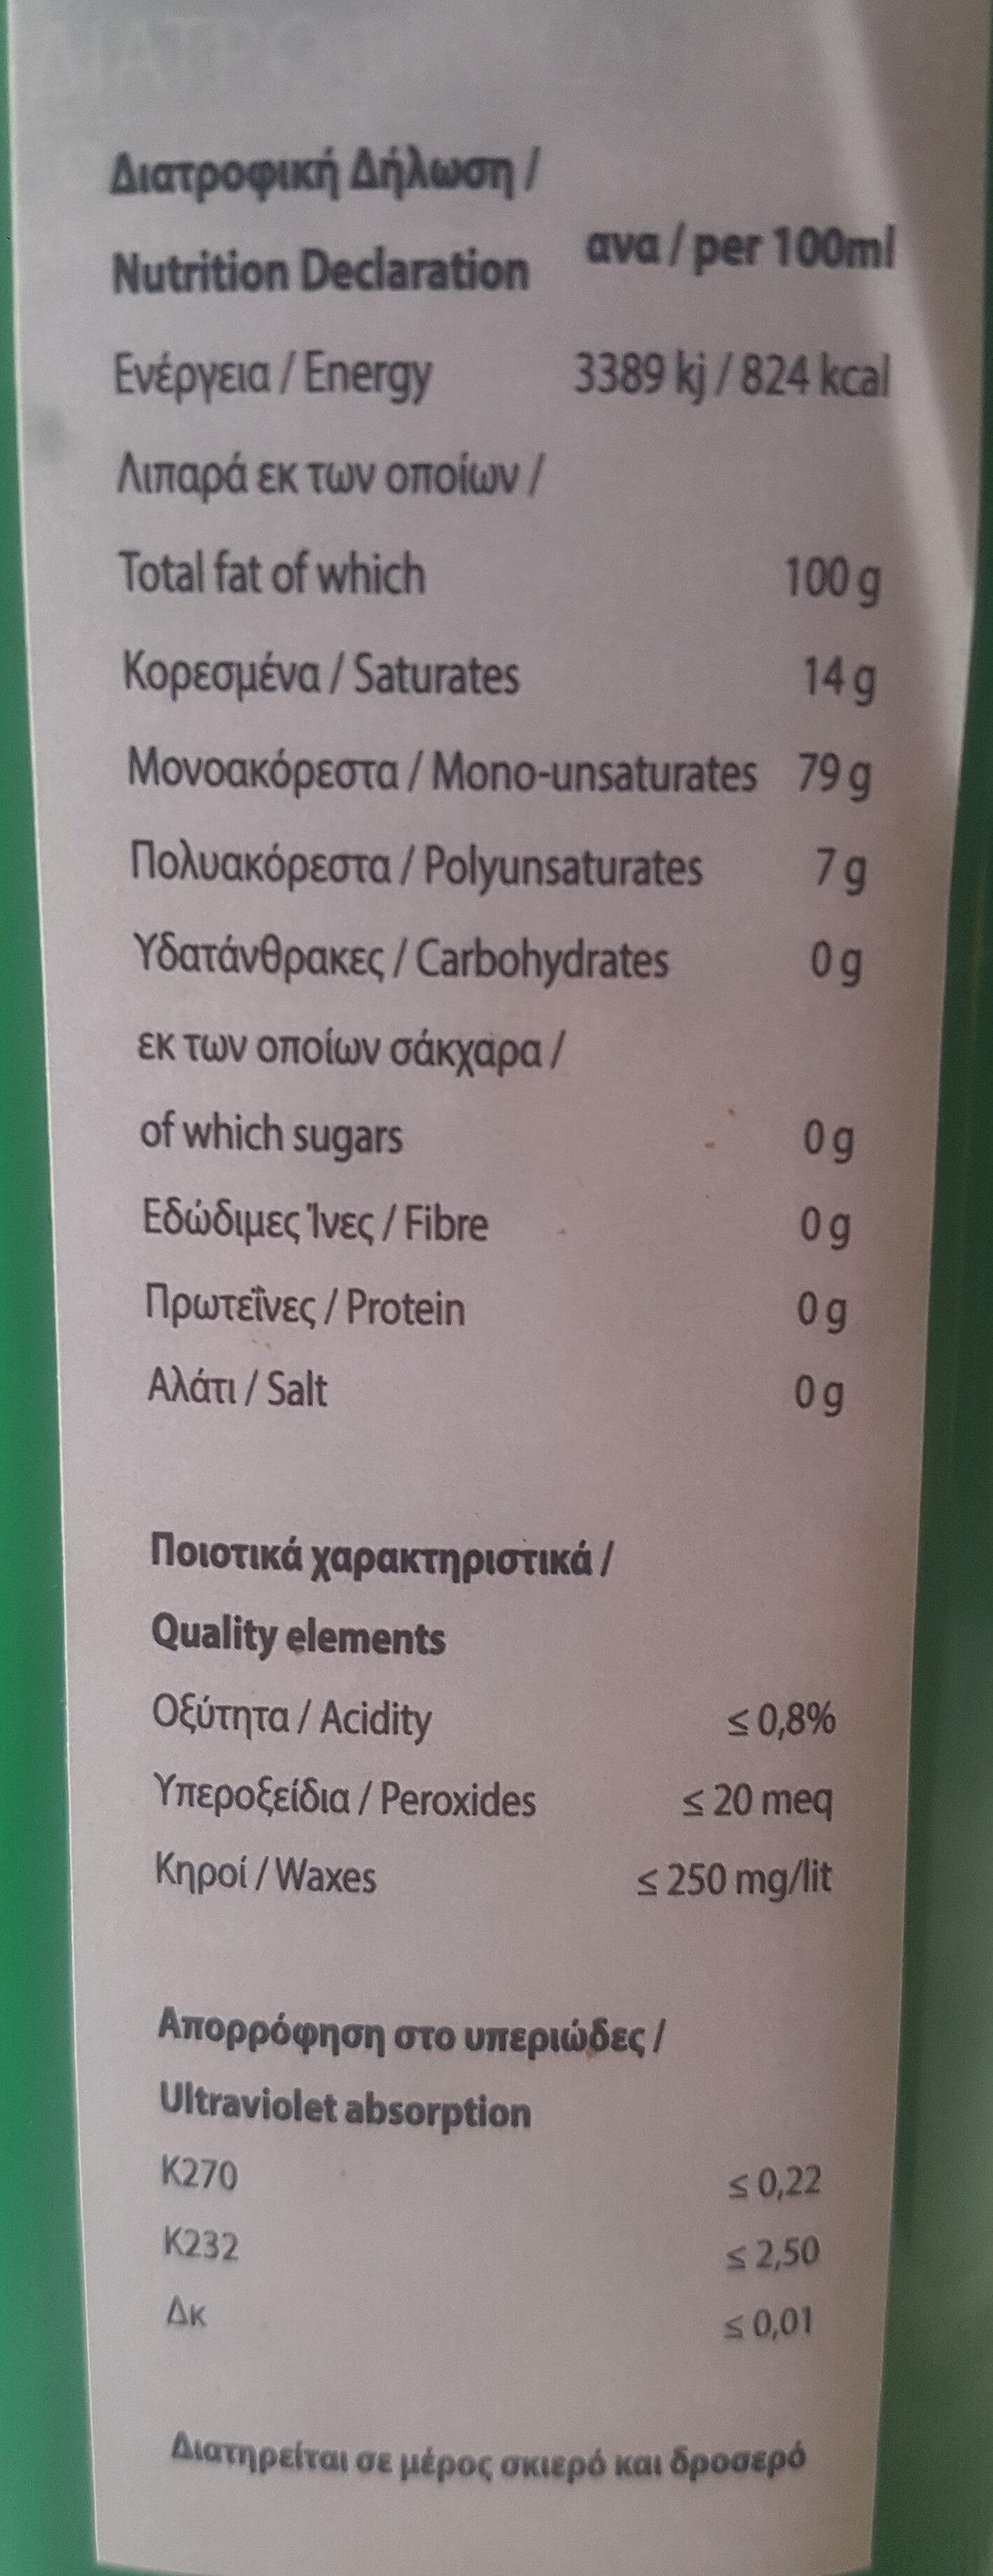 Horizon Organic Virgin Olive Oil - Nutrition facts